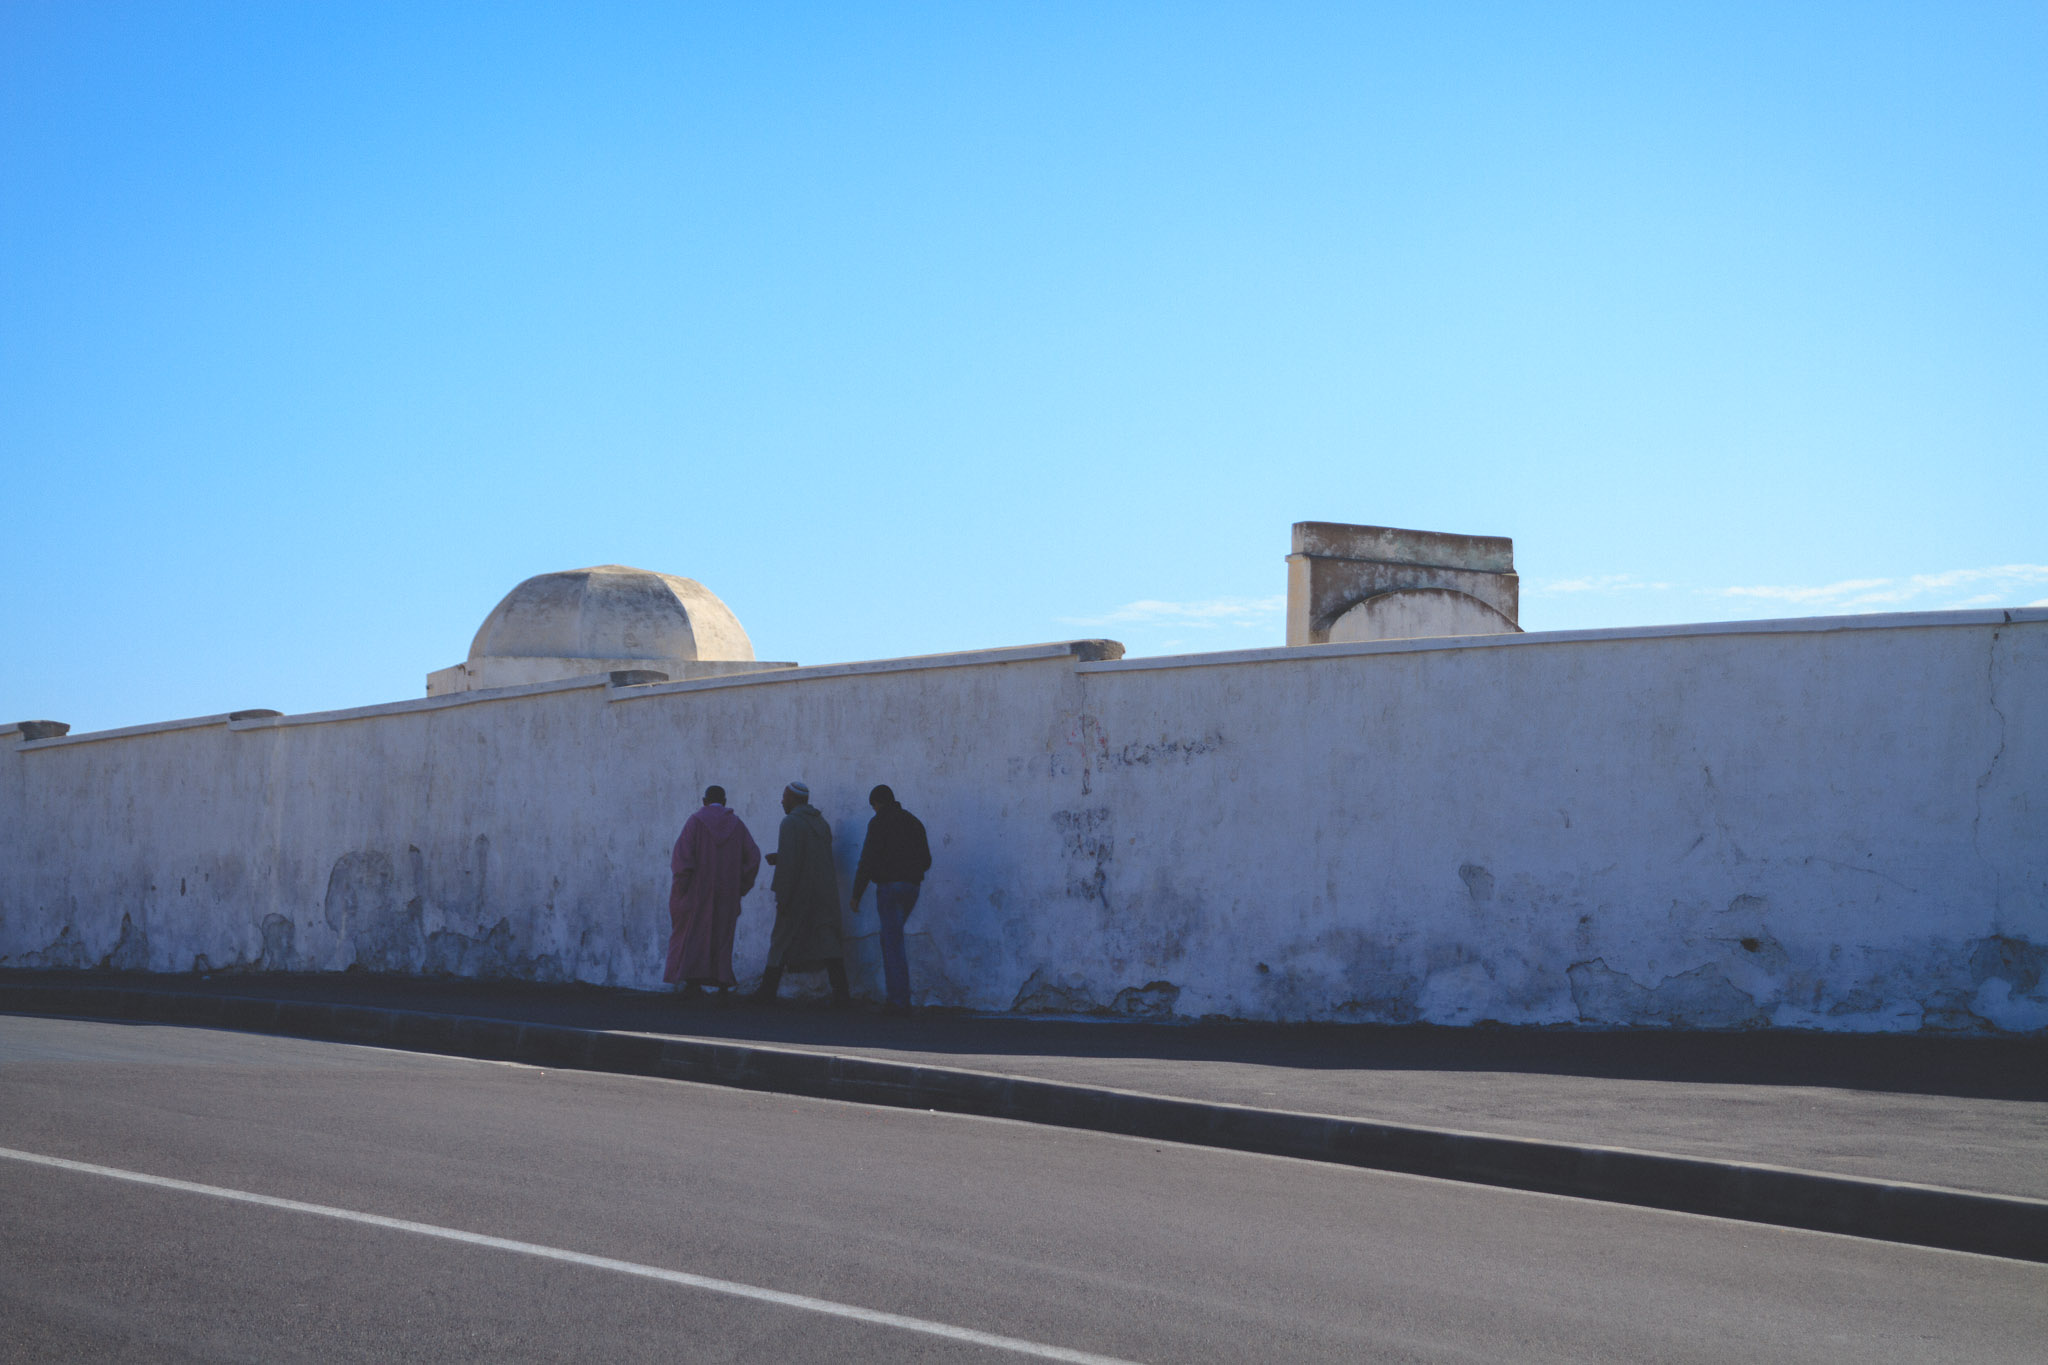 morocco_rabat_fez_casablanca_lesleyade_photography-16.jpg